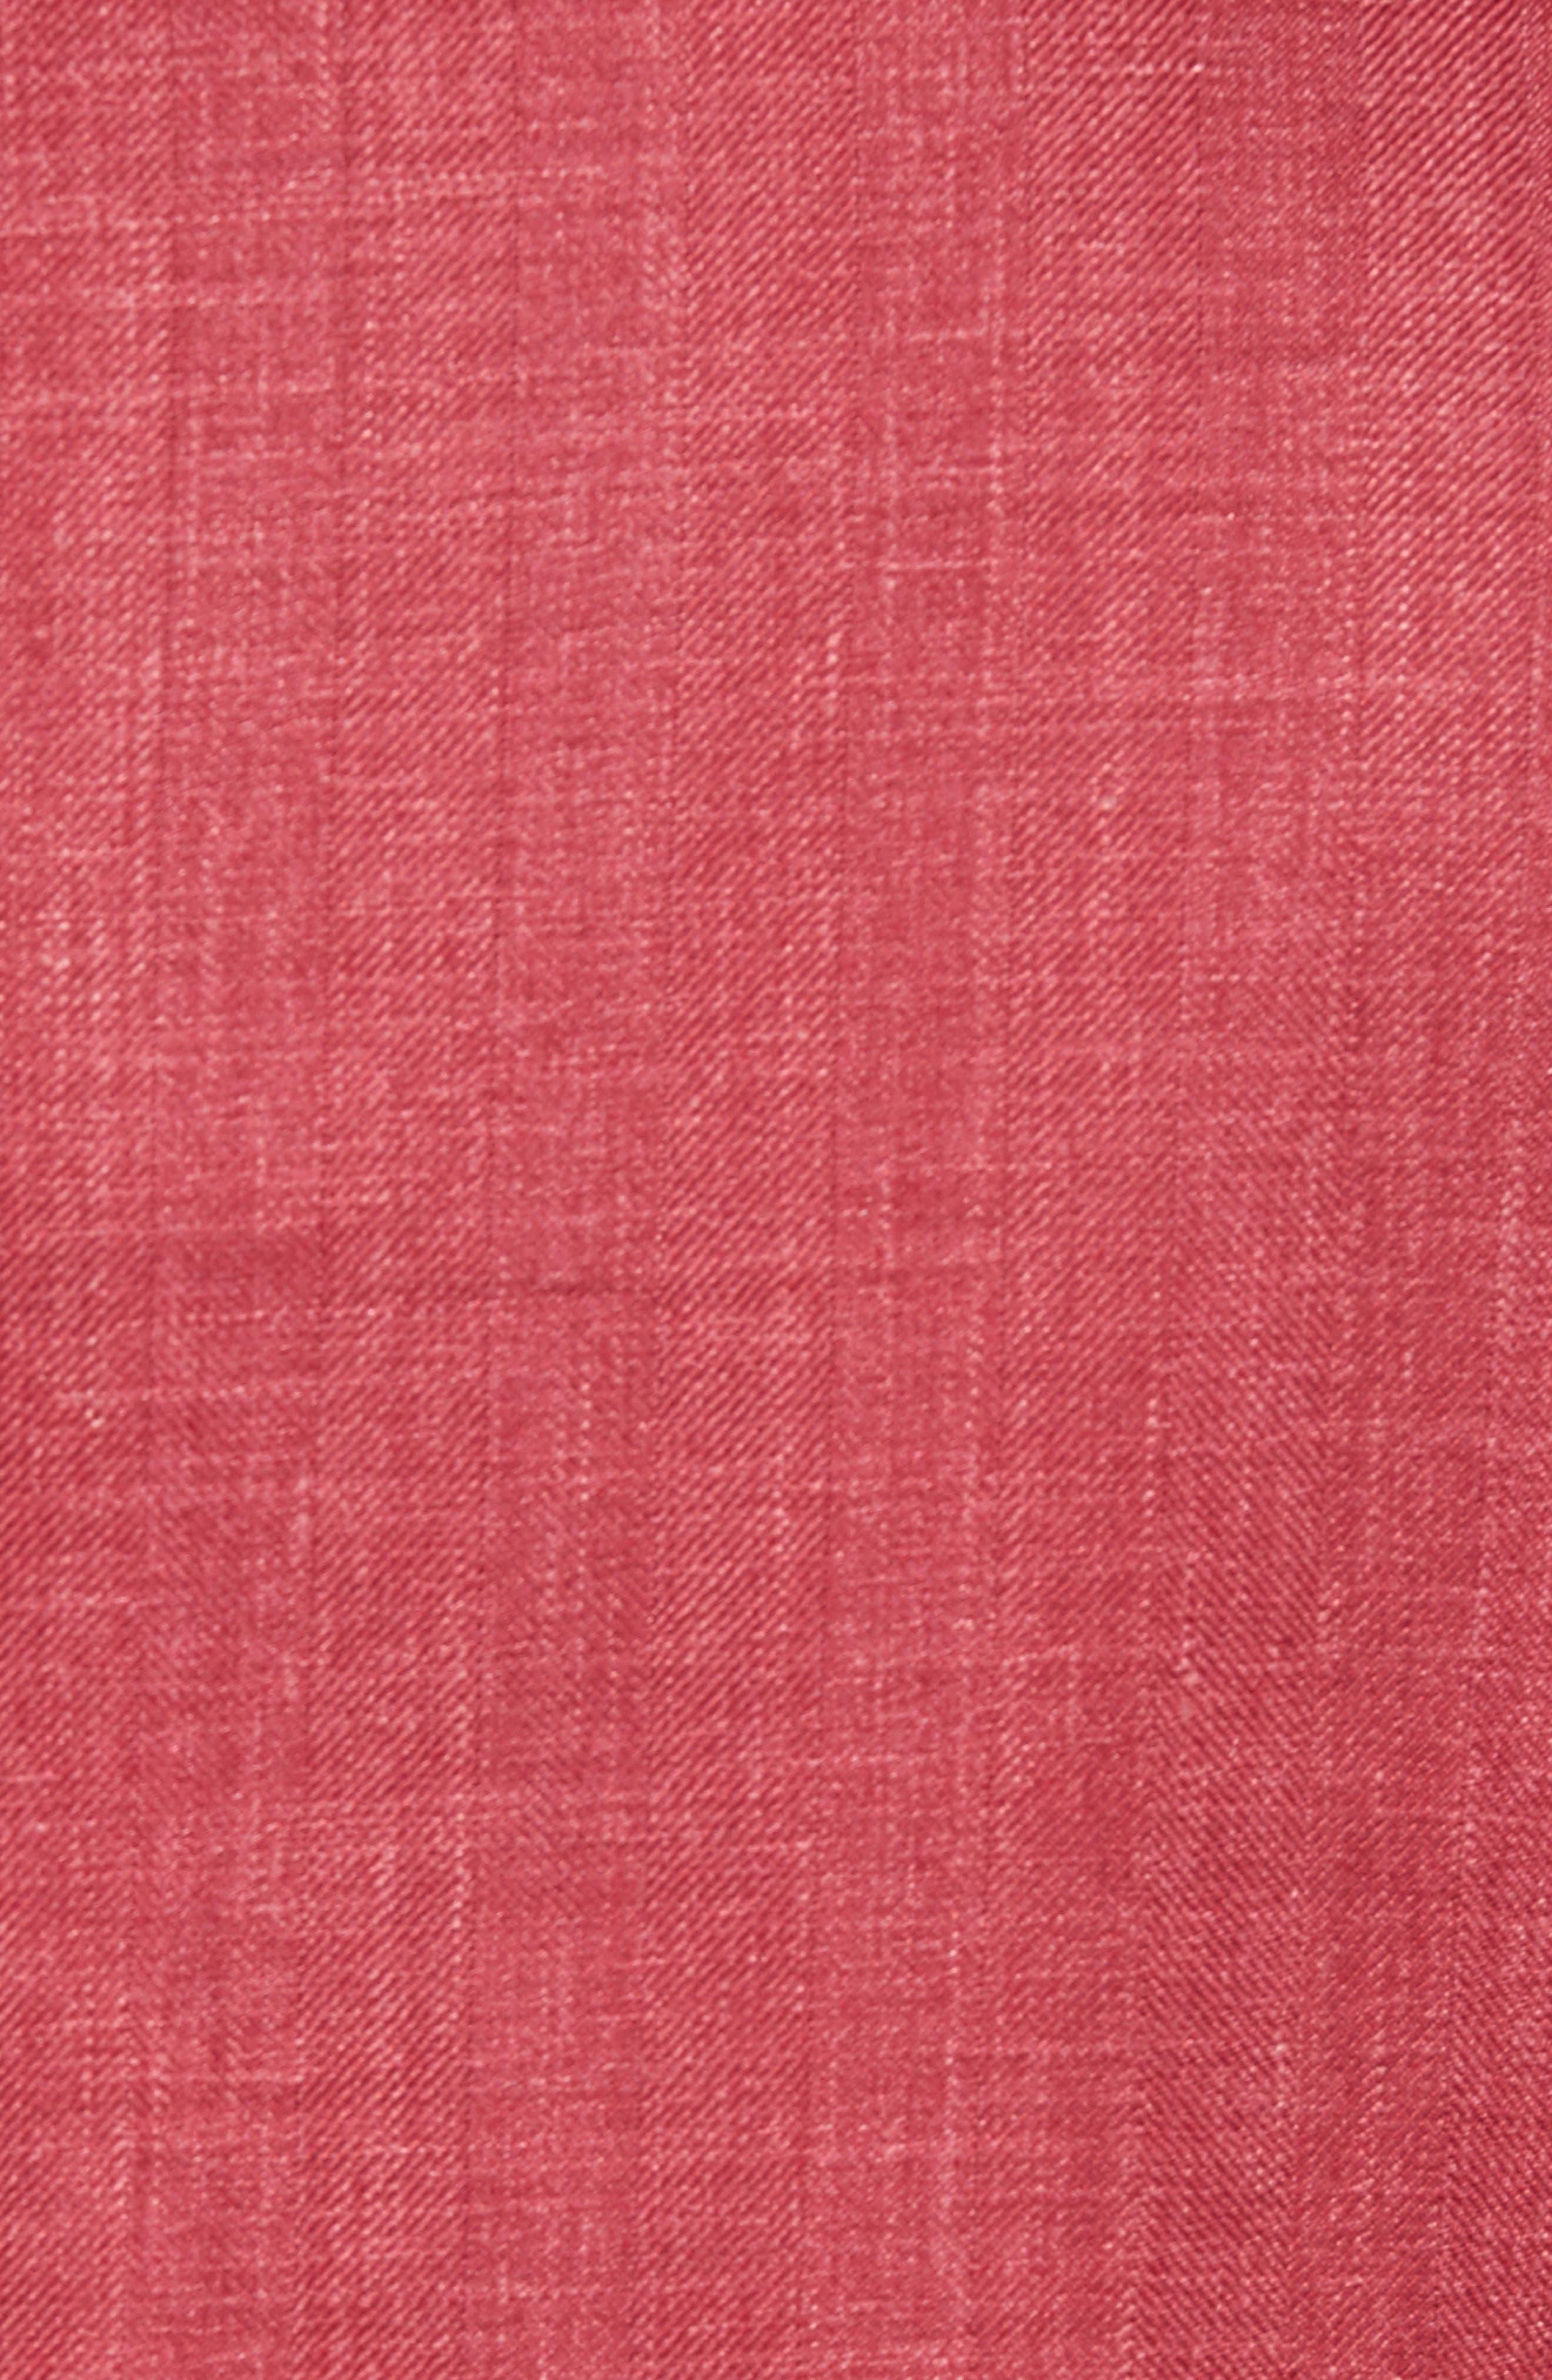 Aiden Classic Fit Wool Blend Blazer,                             Alternate thumbnail 6, color,                             600